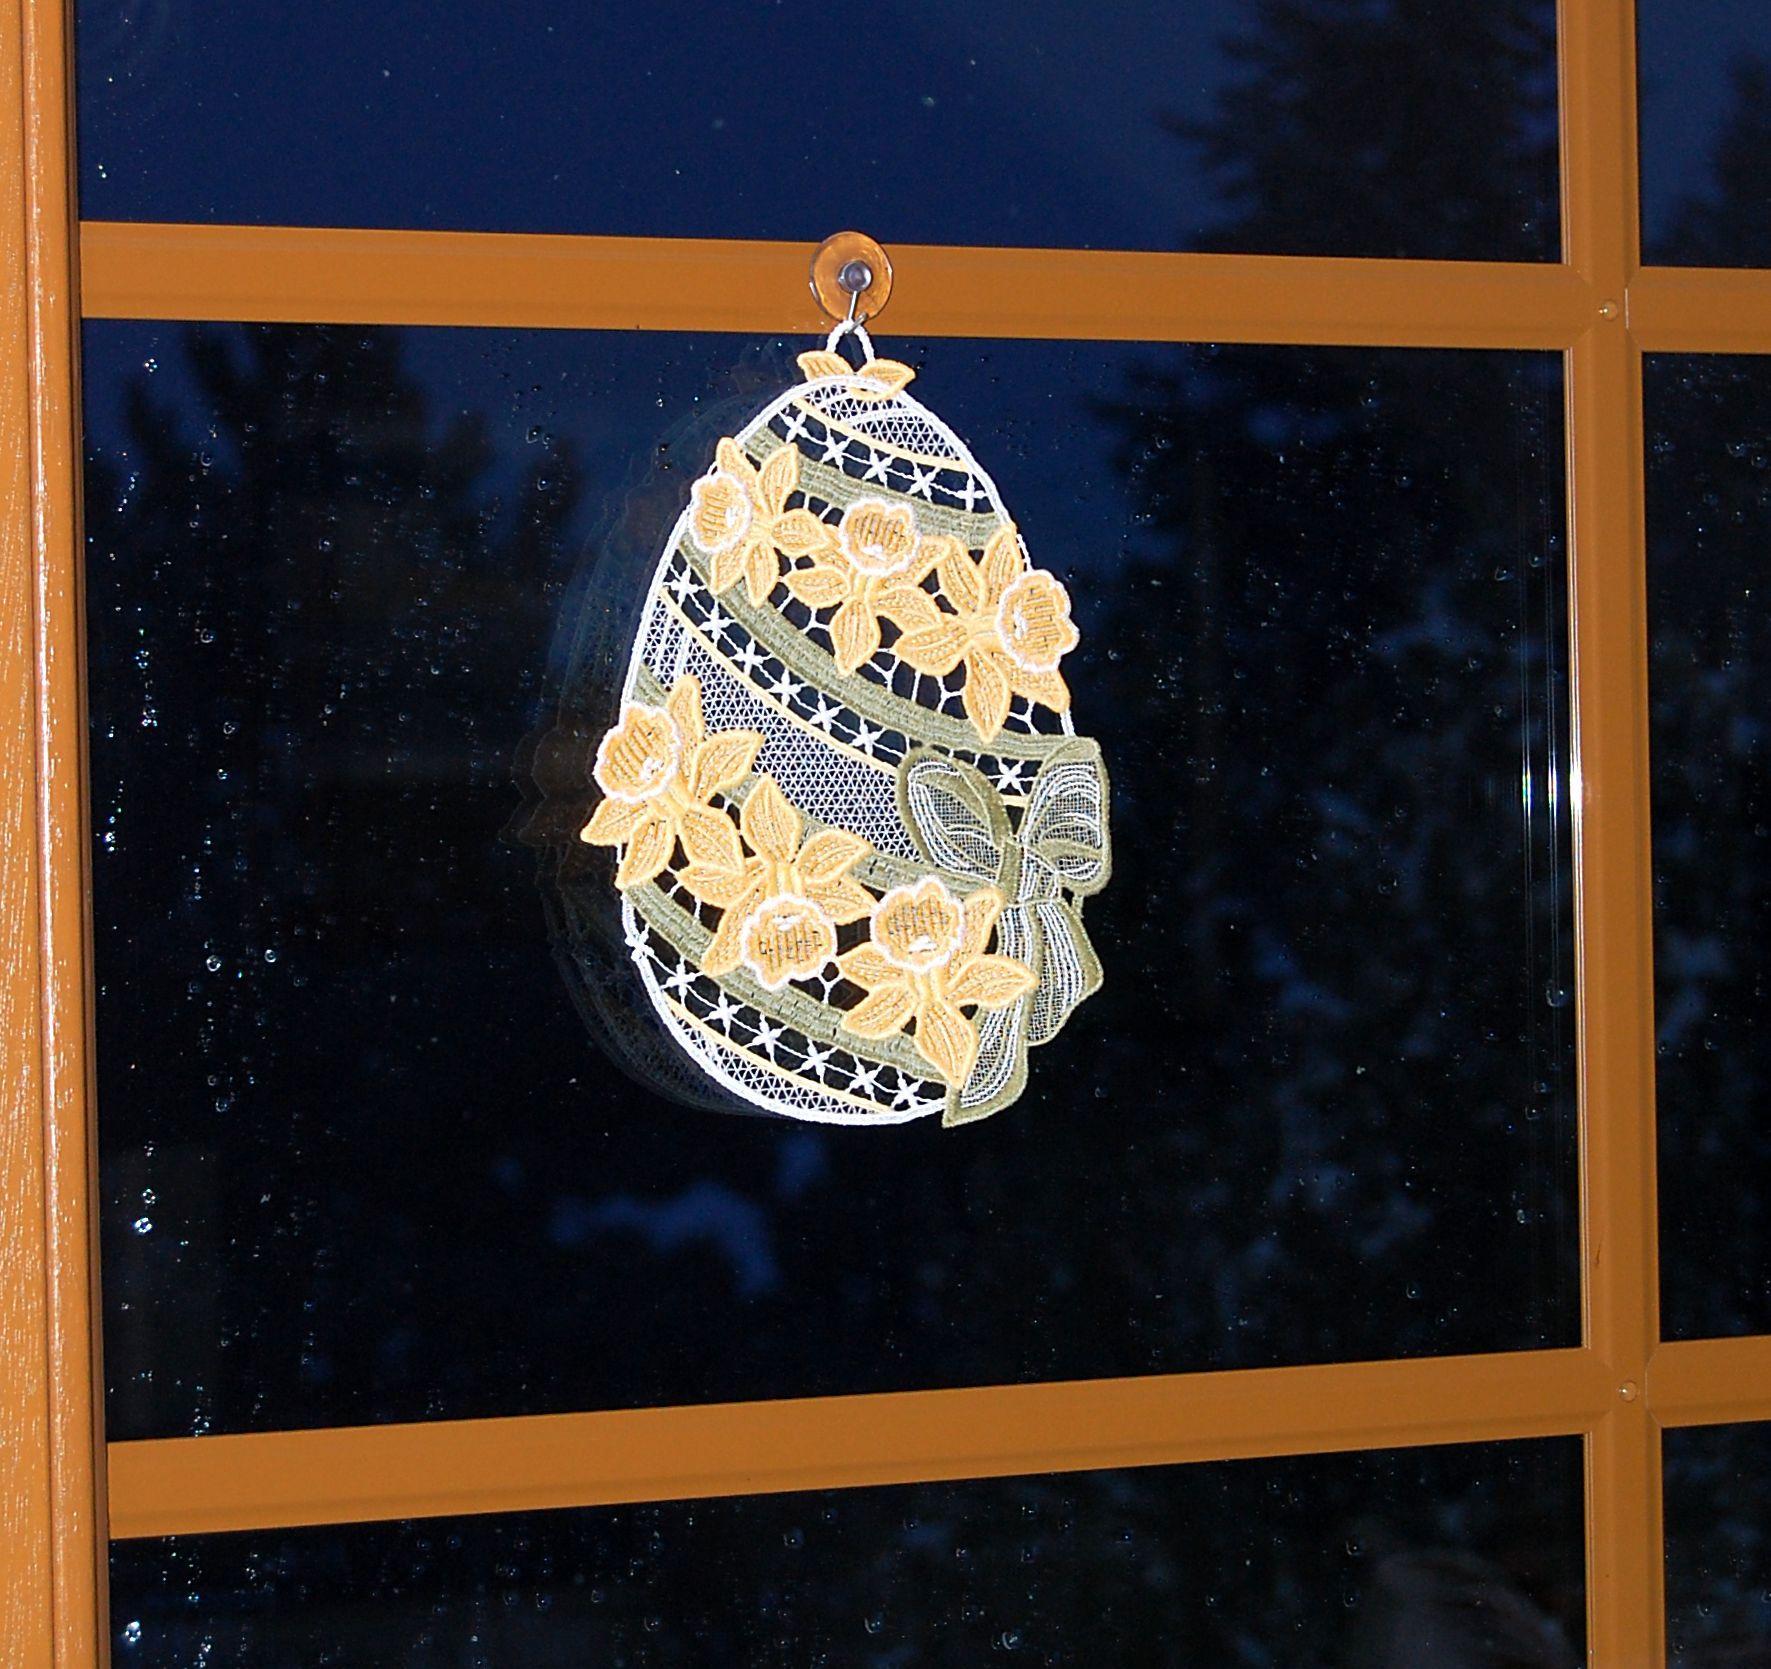 Rosen Orange Fensterbild Plauener Spitze Fensterdeko Fensterschmuck Spitzenbild